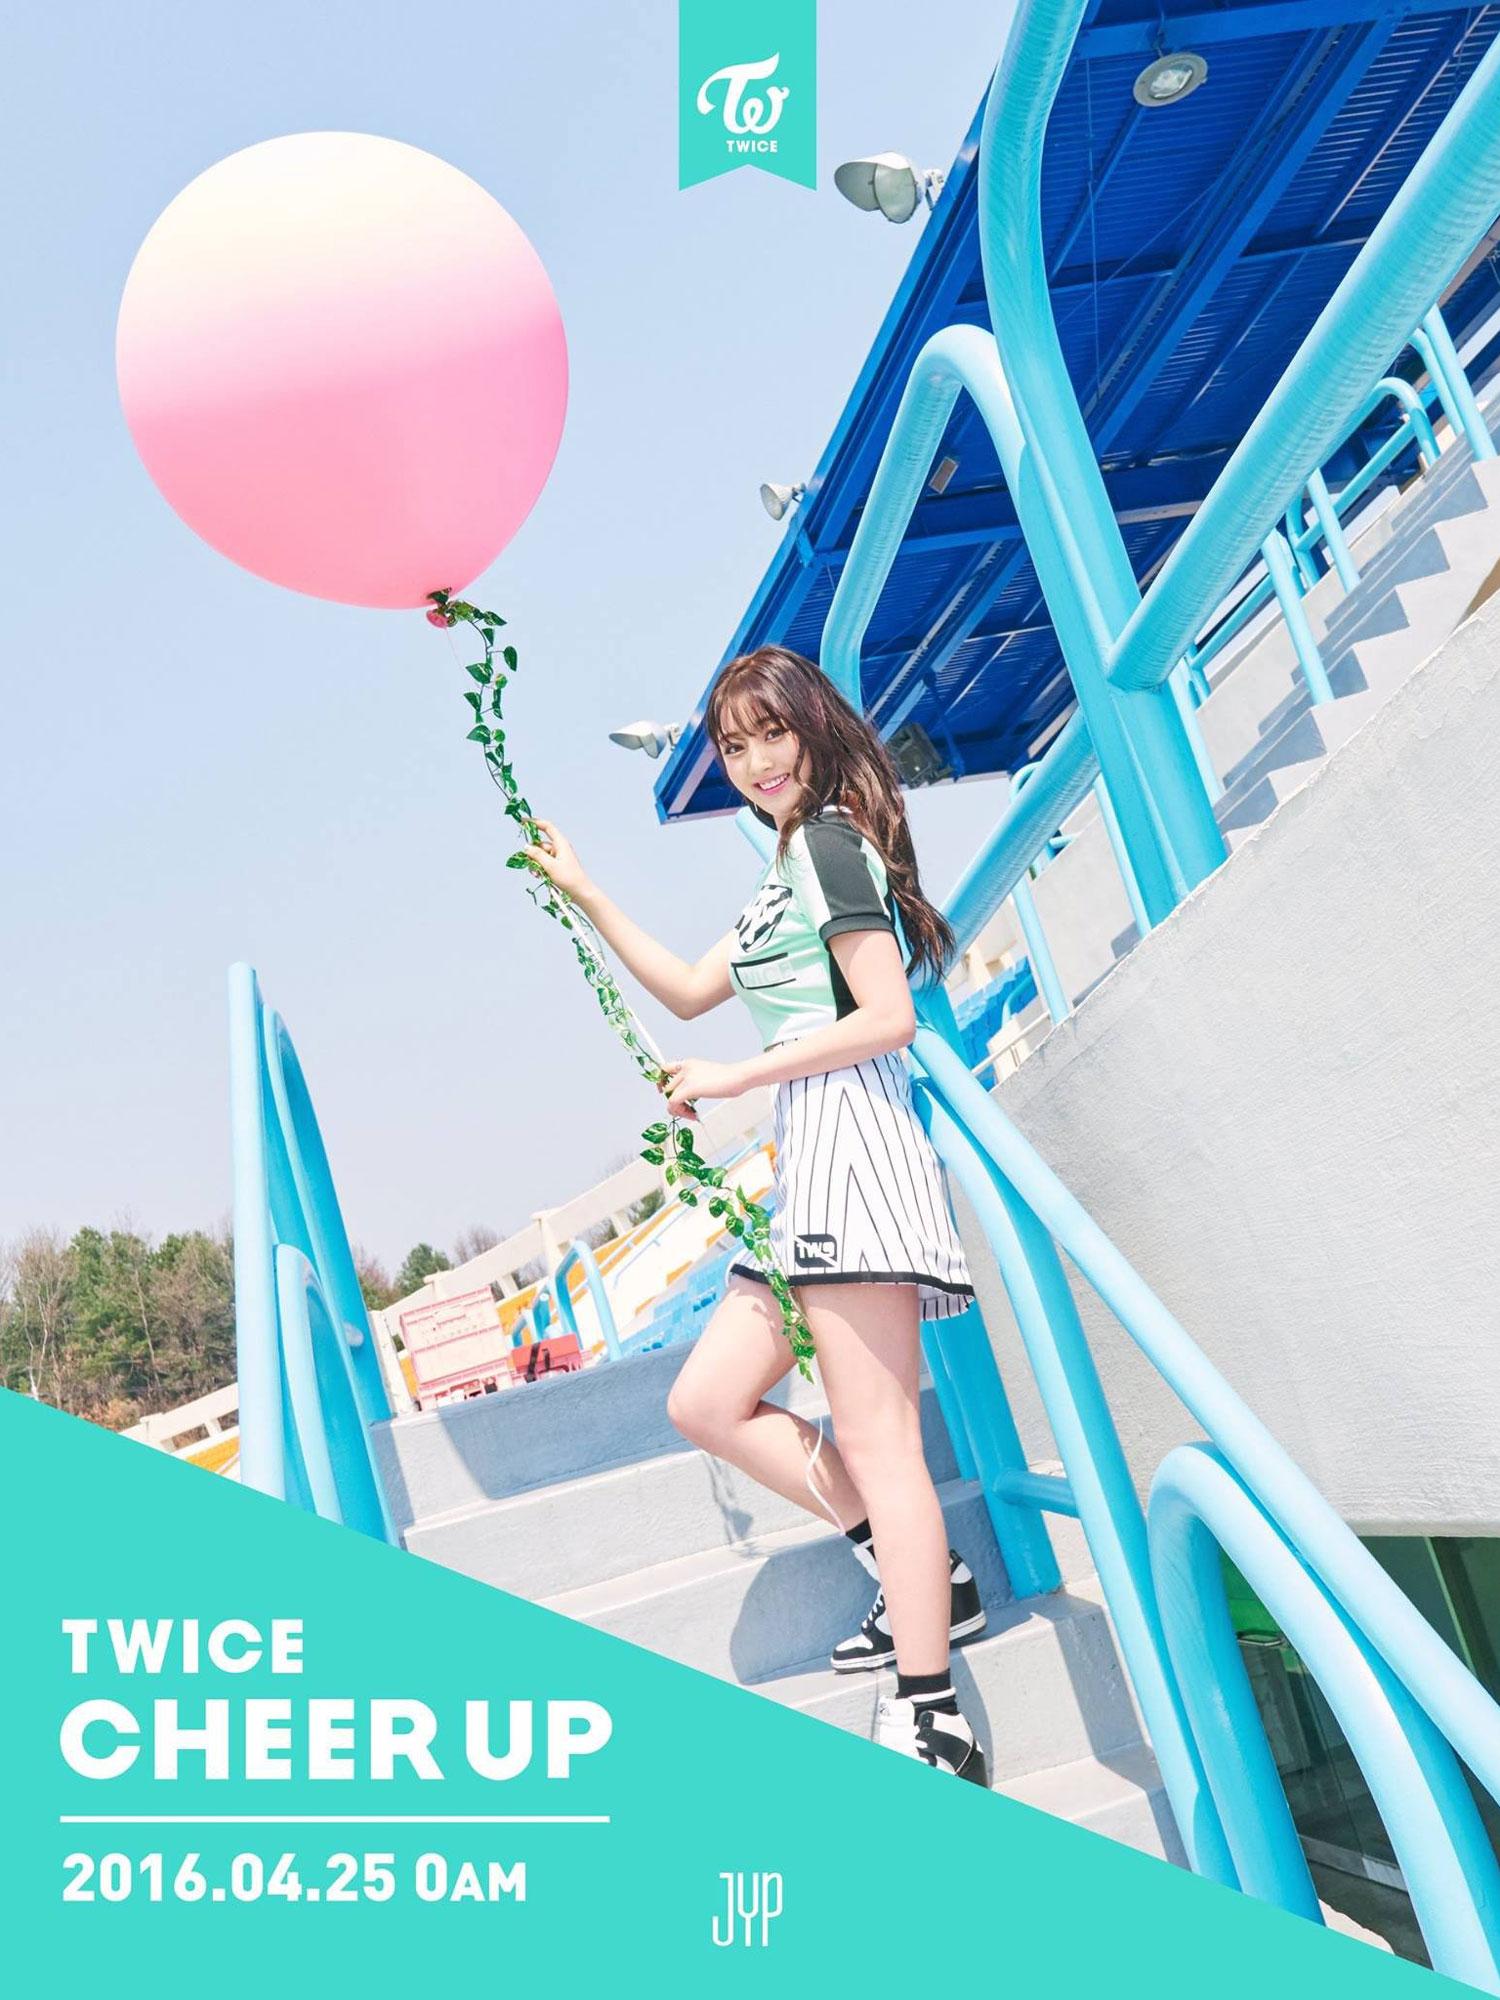 TWICE Jihyo Cheer Up album concept photo